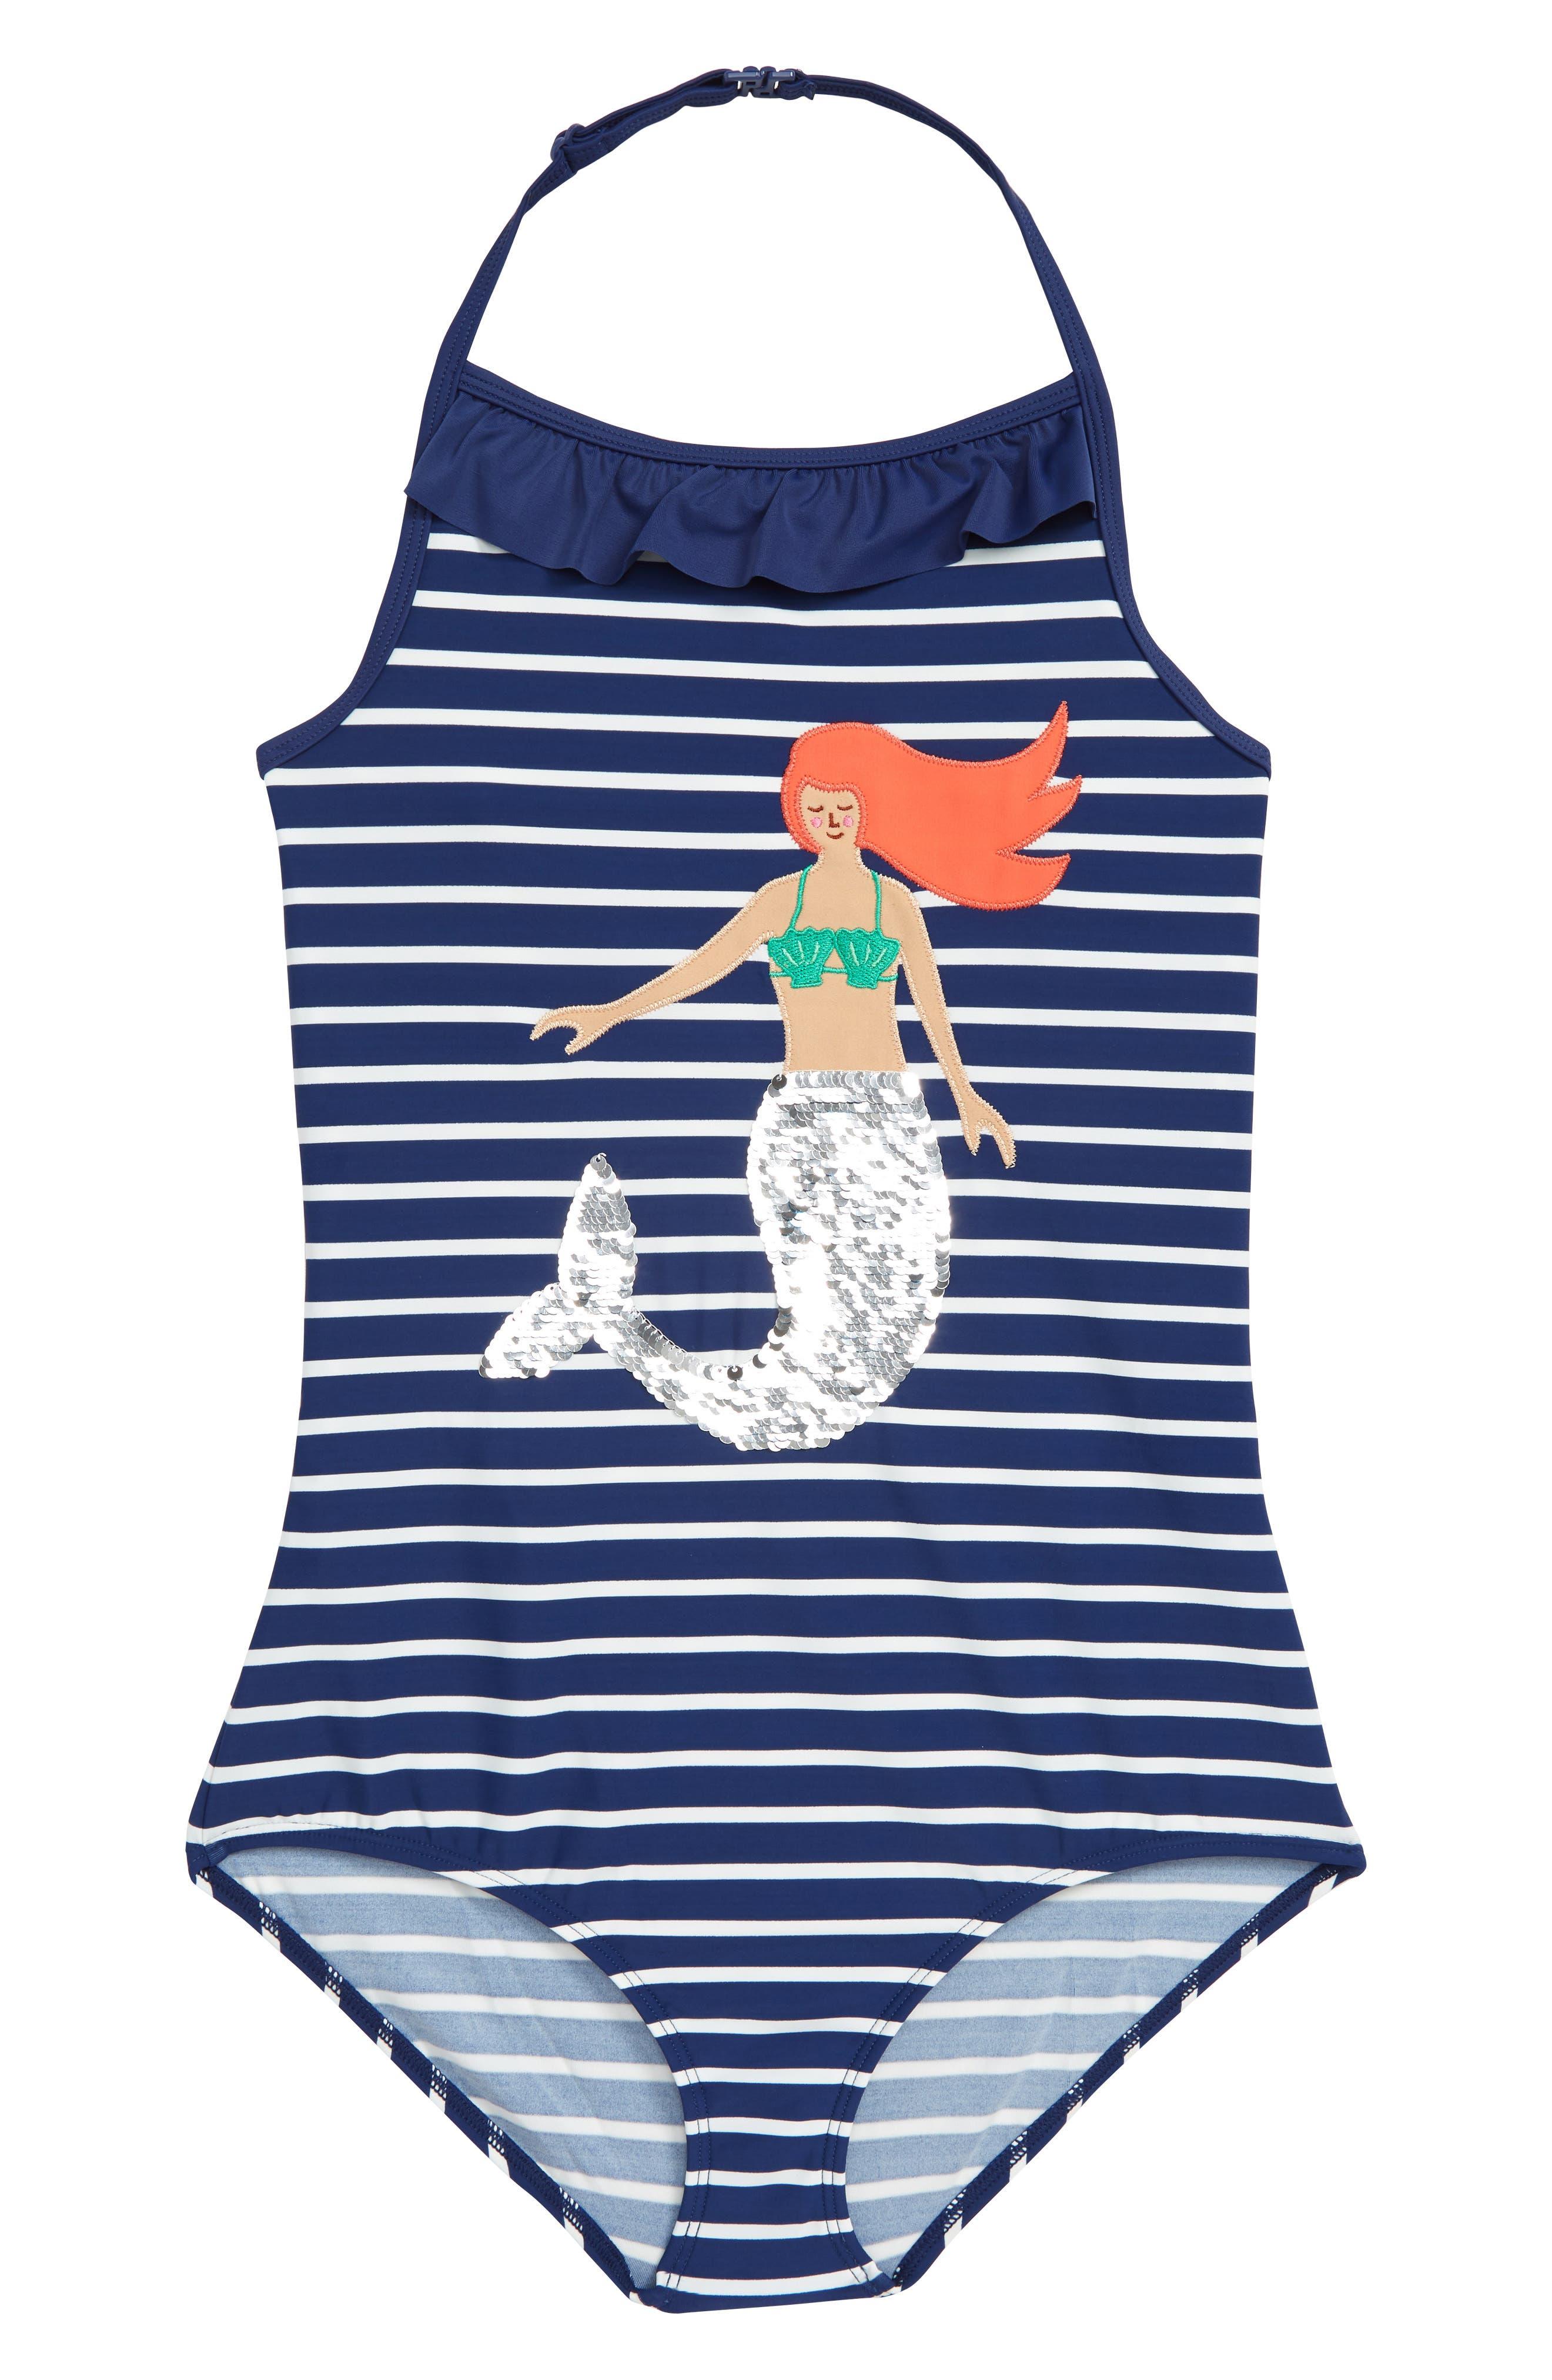 05a2176844d23 Girls' Mini Boden Swimsuits   Nordstrom